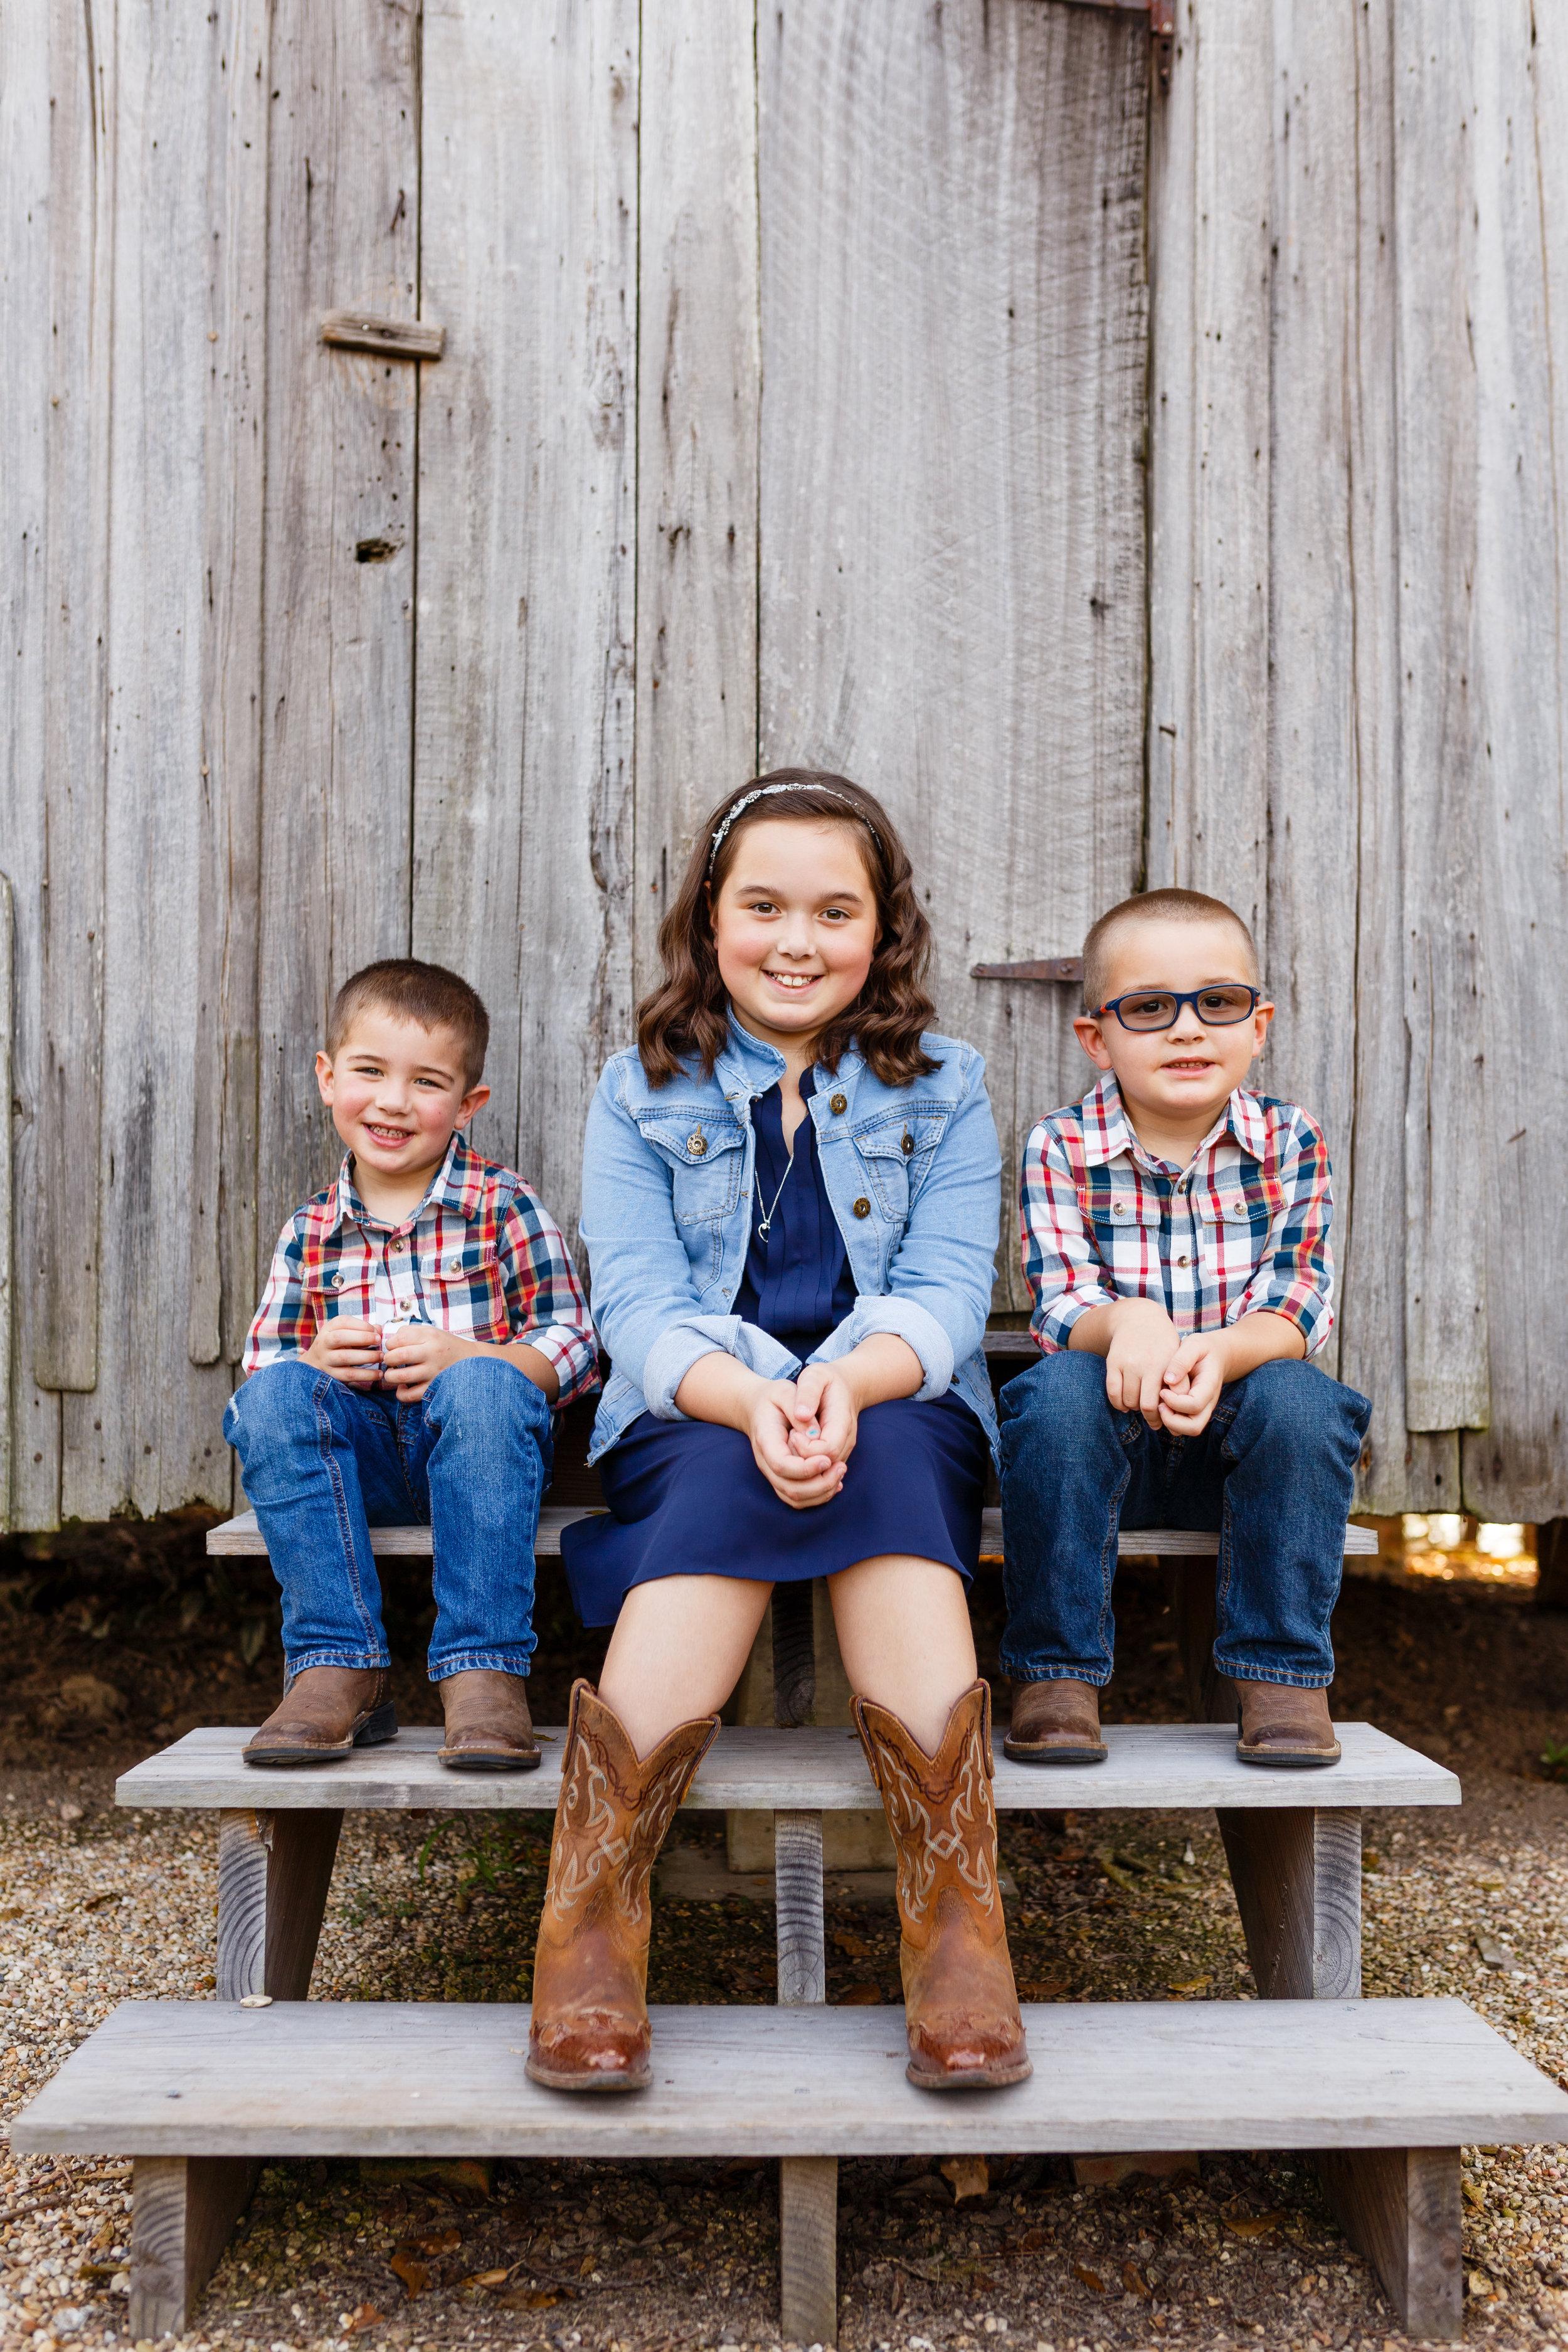 Youngsville-lafayette-portrait-family-wedding-photographer-7300.jpg